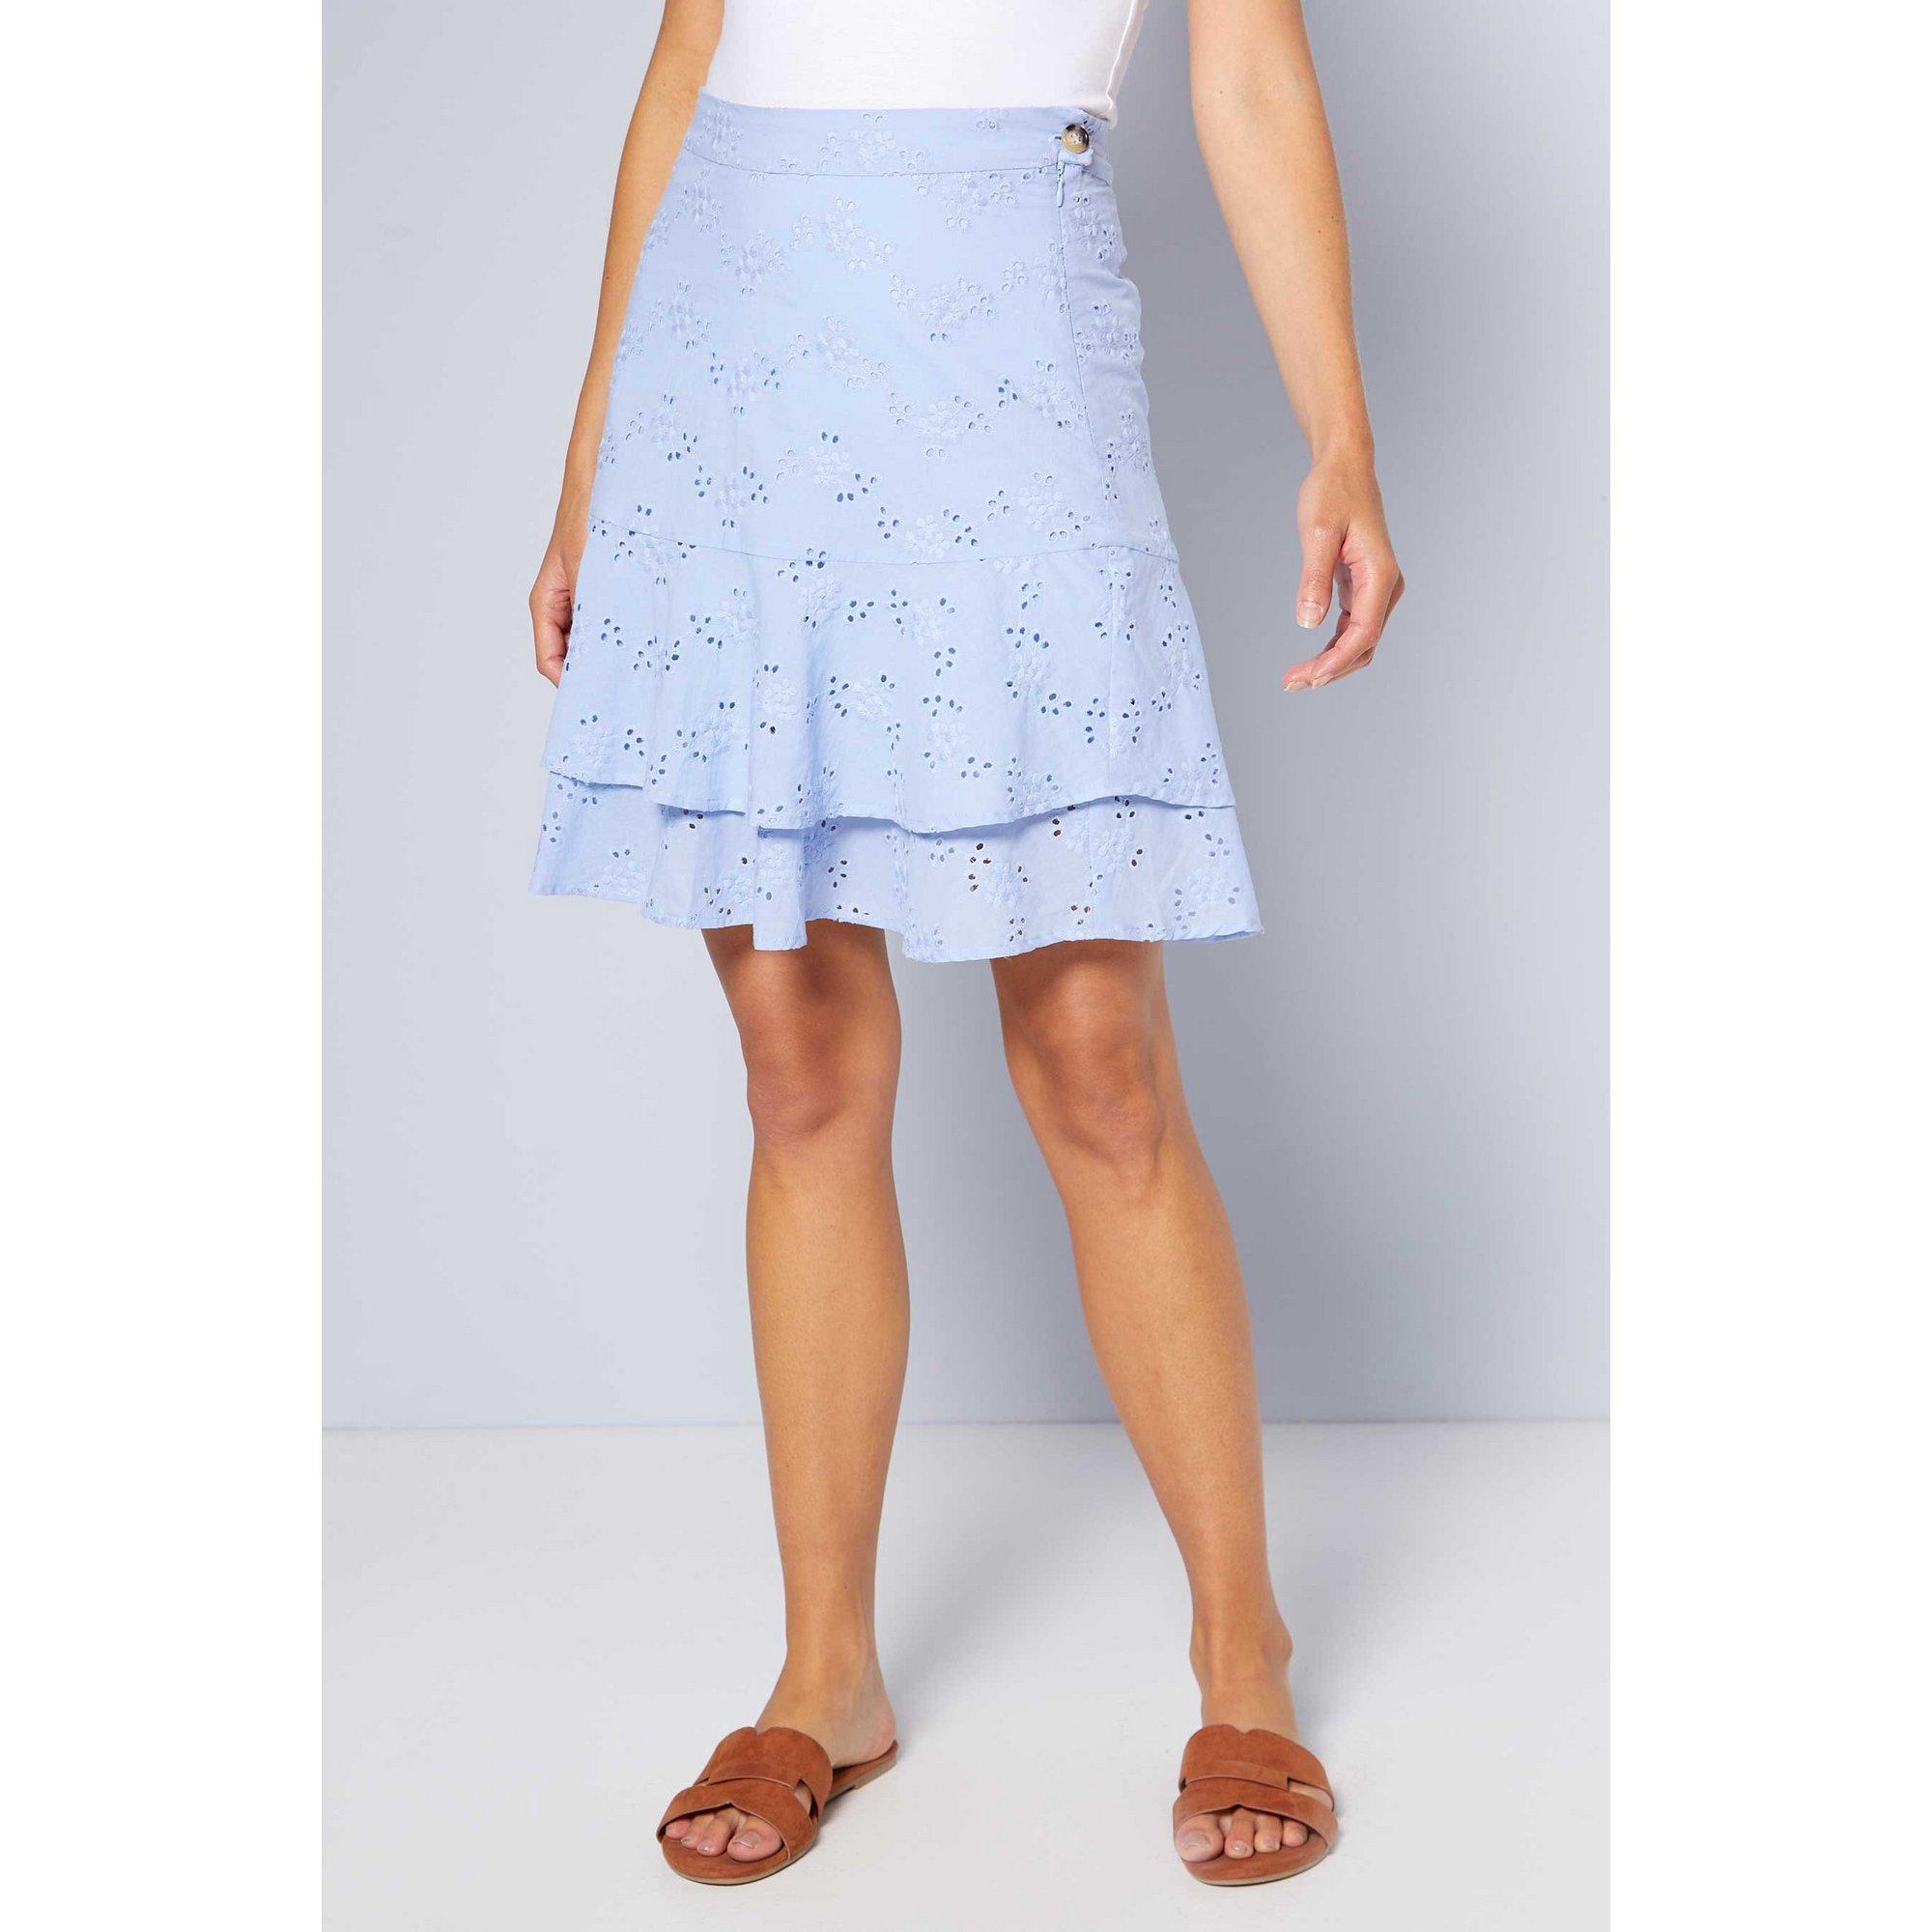 Image of Blue Broderie Frill Skirt